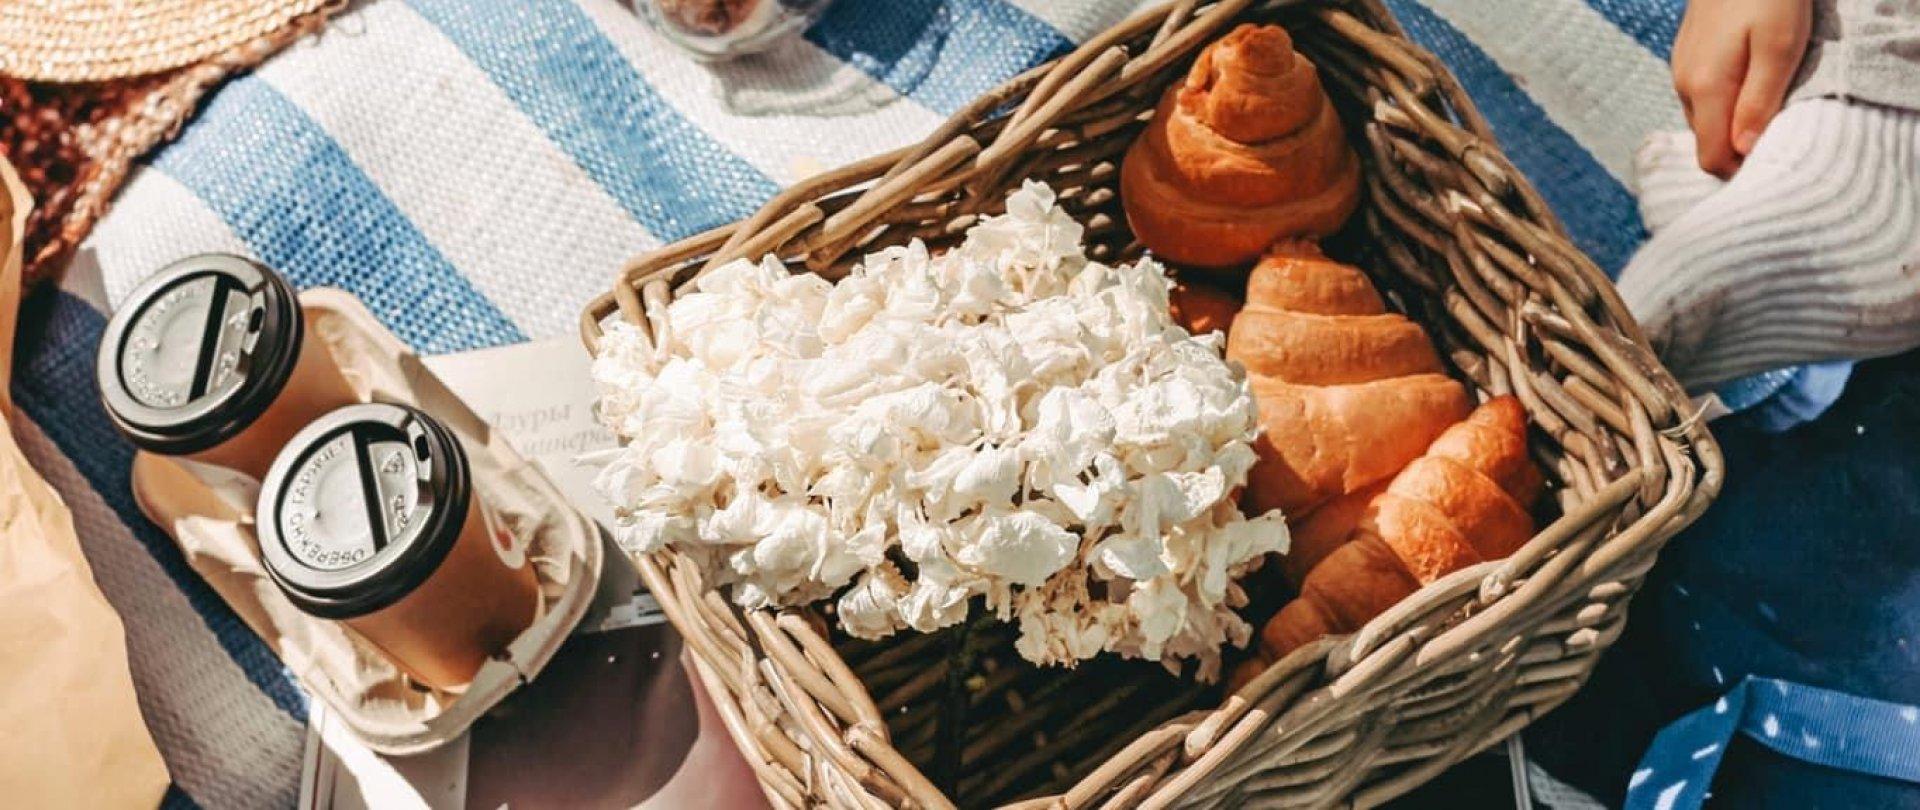 Piknik w Jakubusie